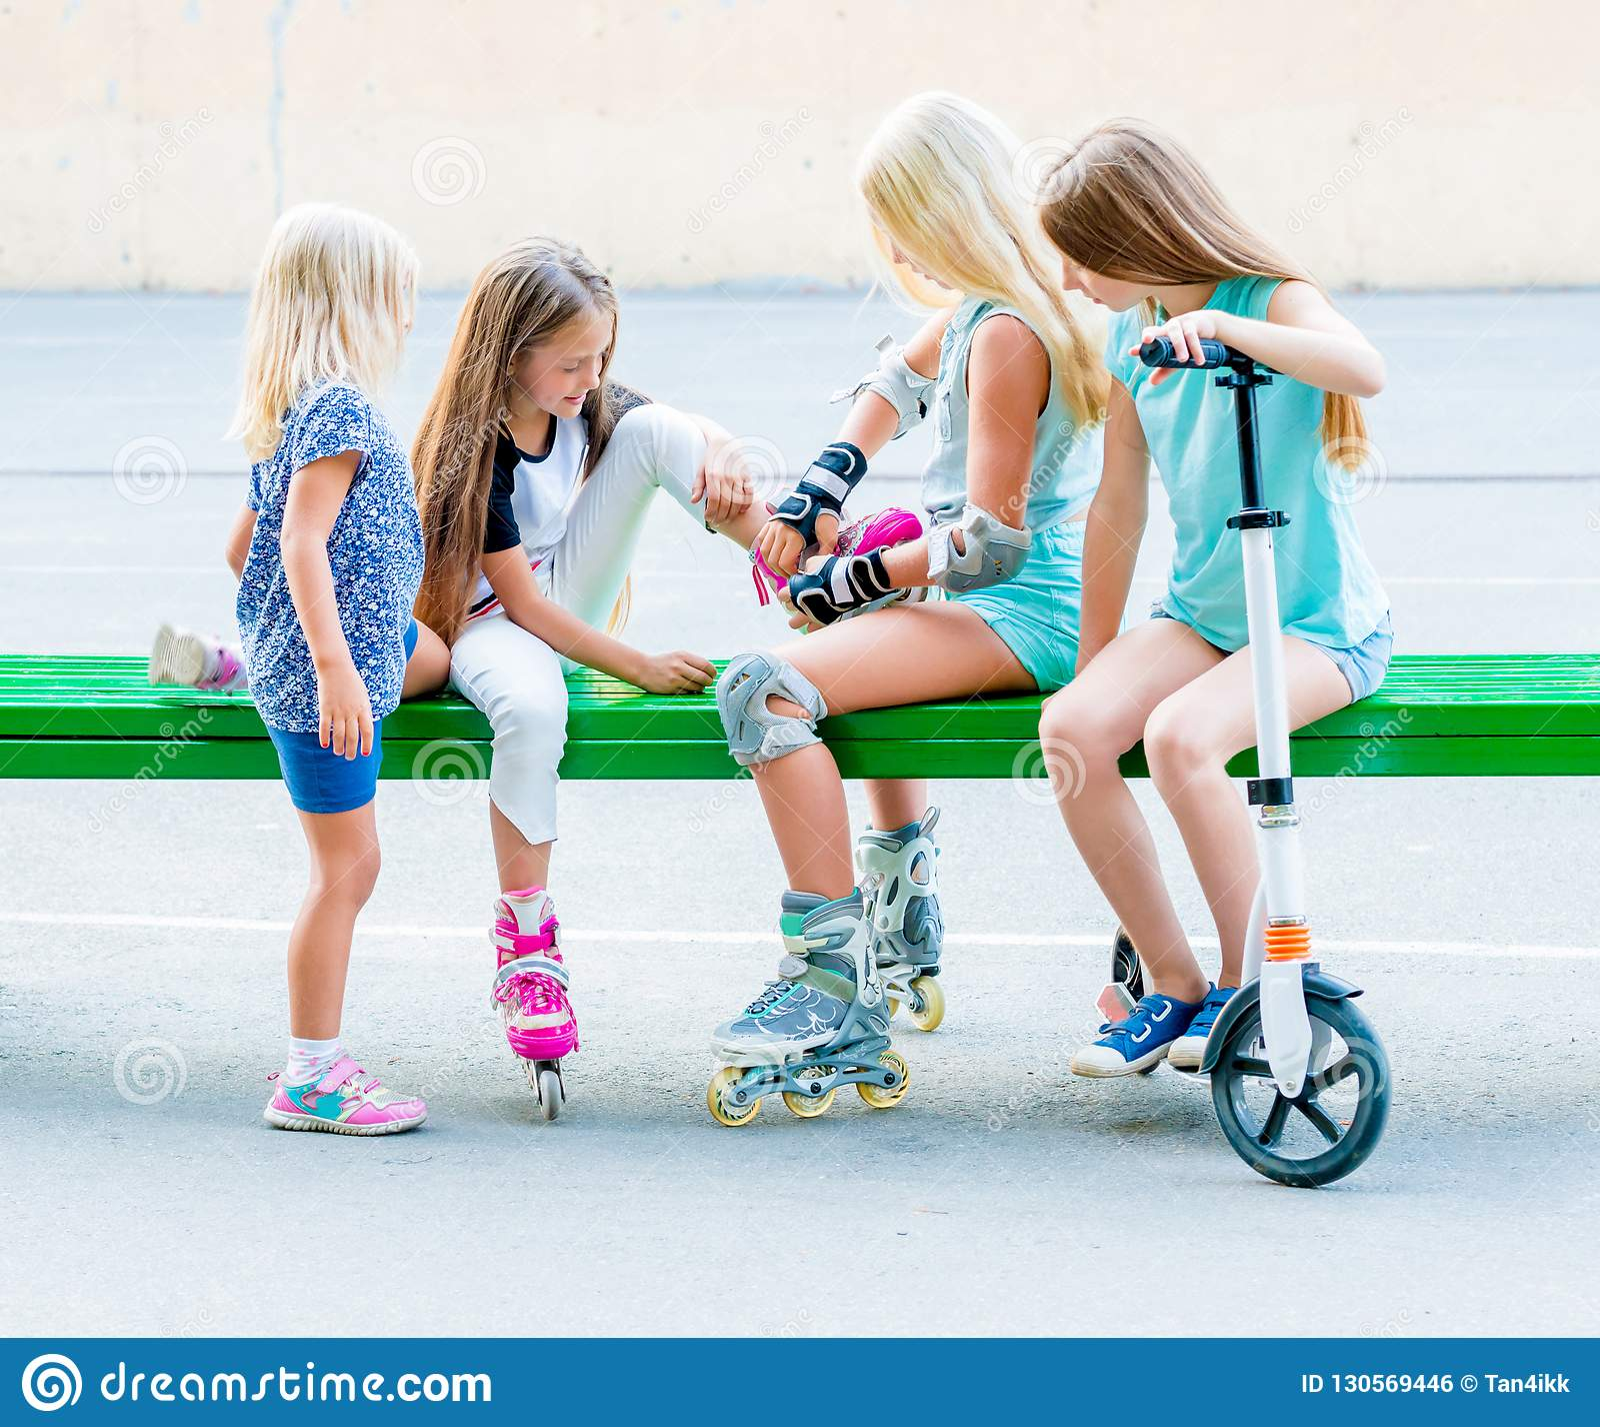 Little girls putting on rollerskates